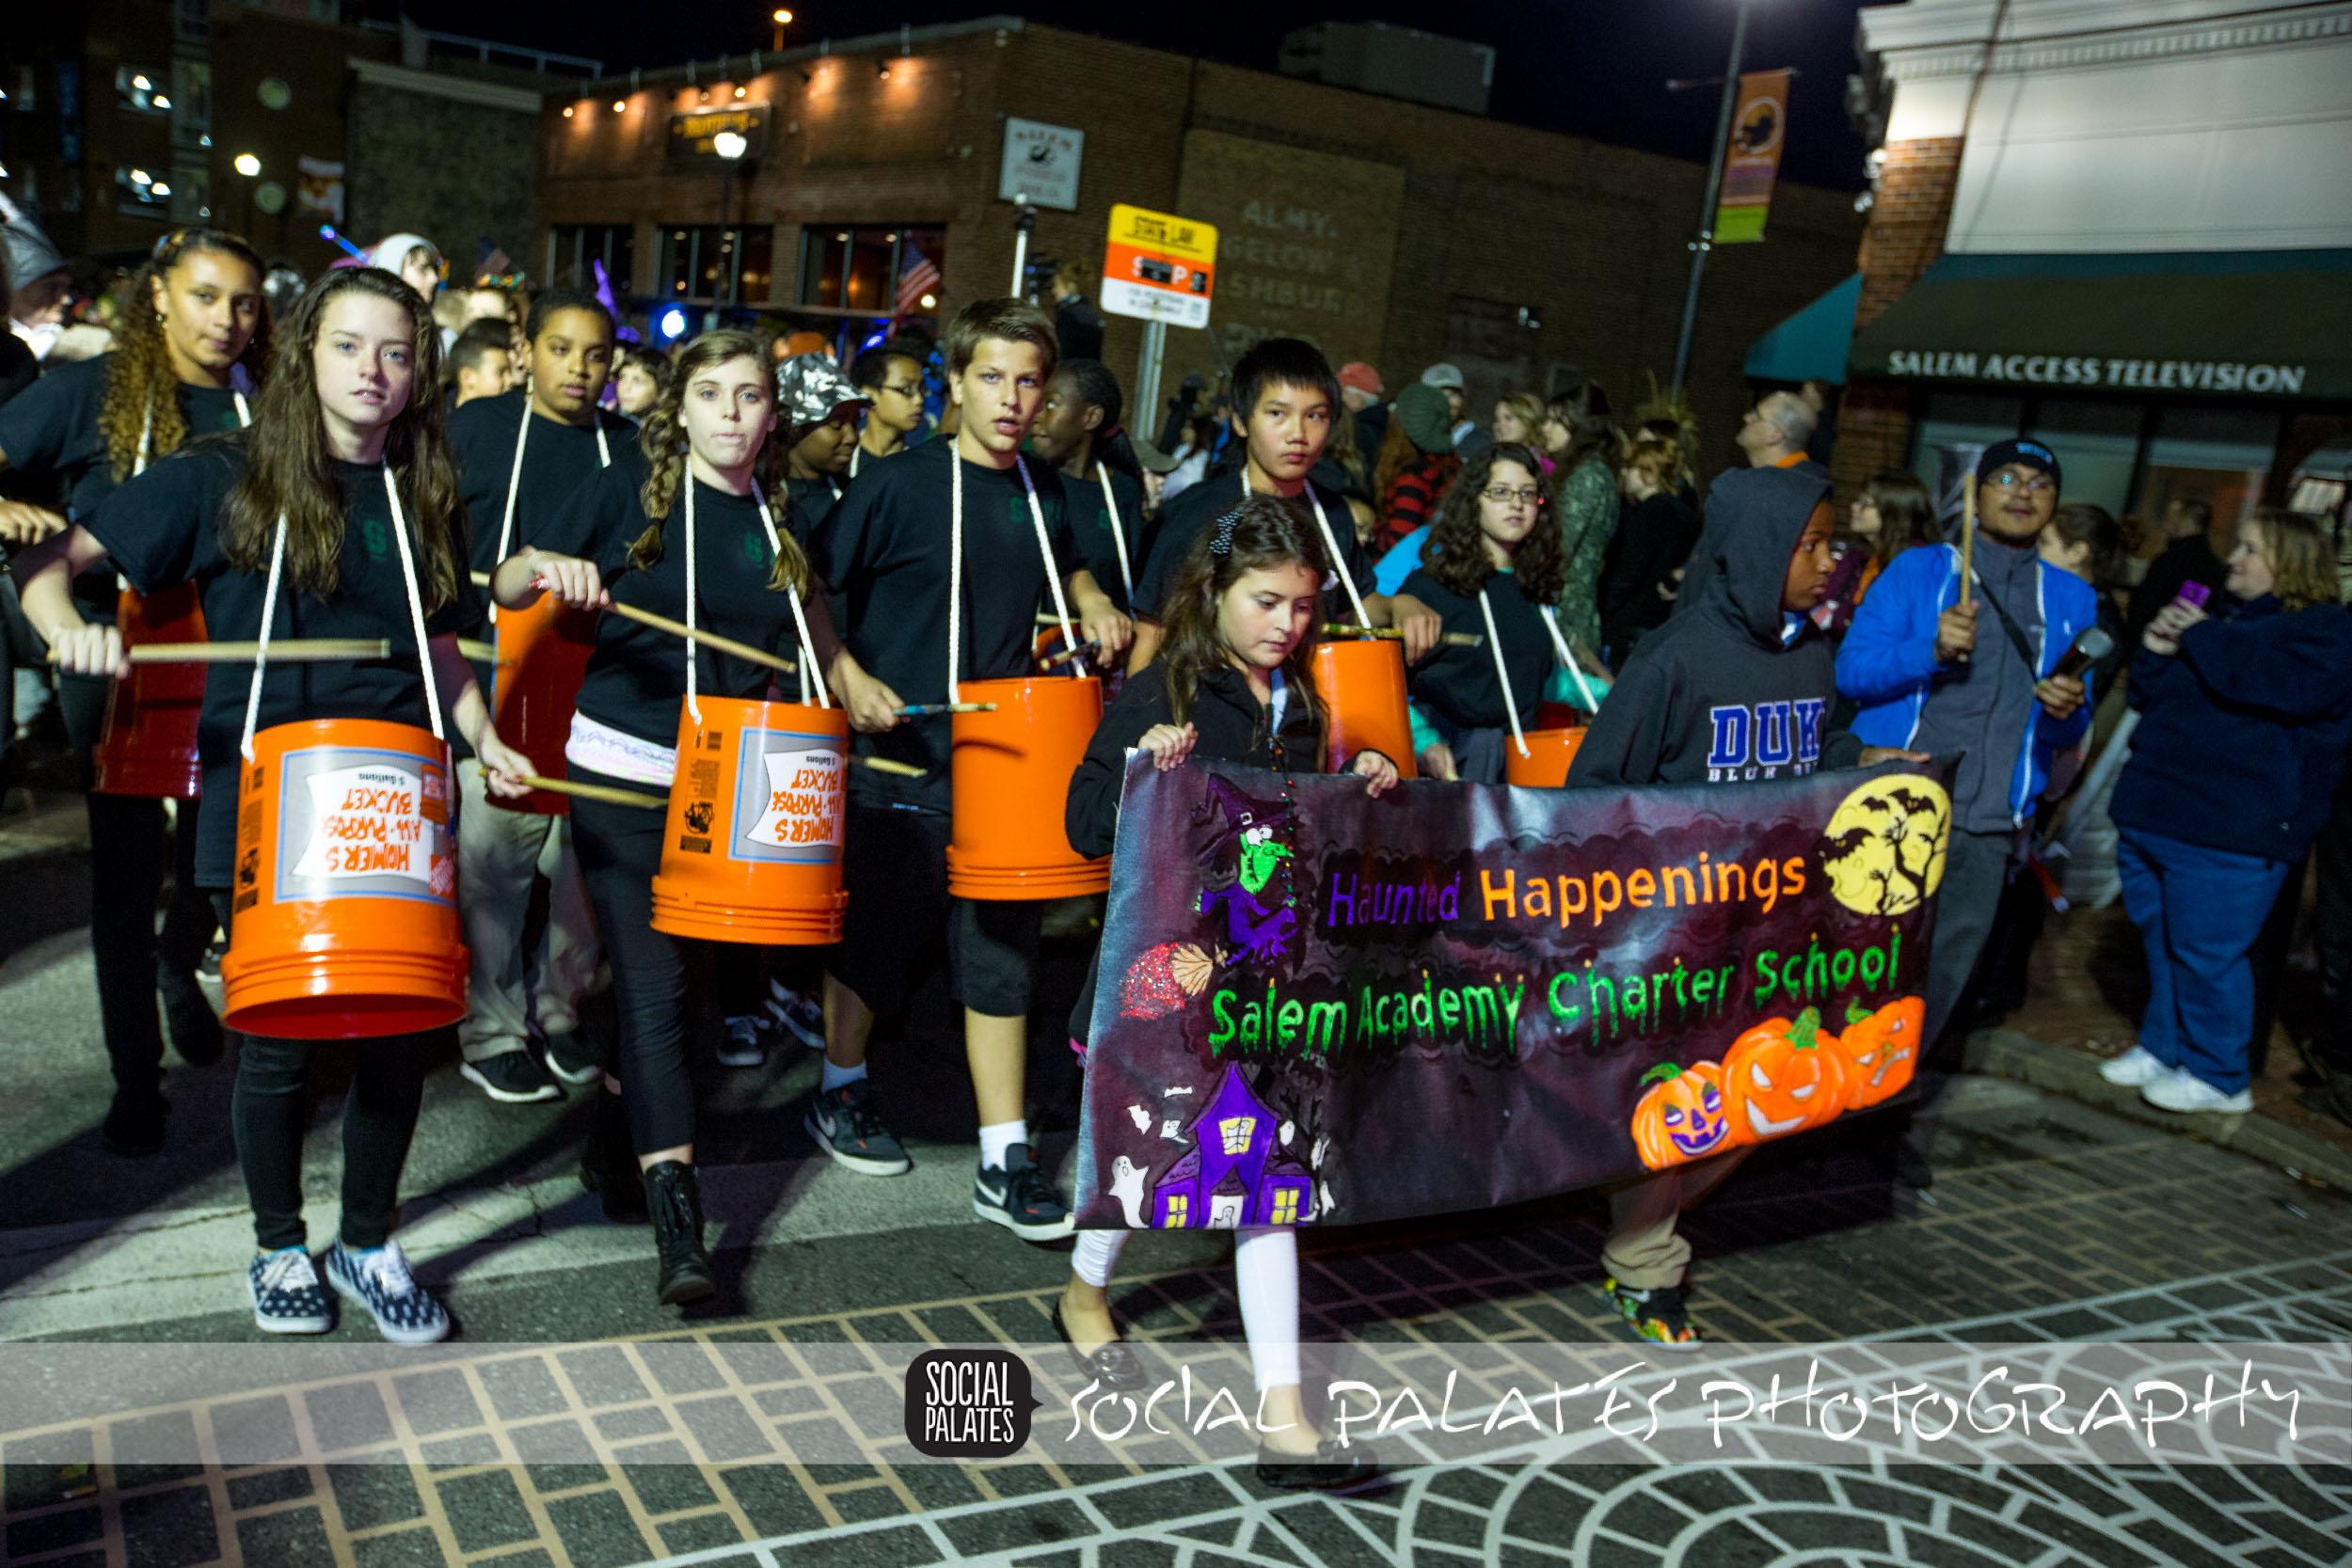 Haunted Happenings Parade 2014 Creative Salem by Social Palates-7578.jpg